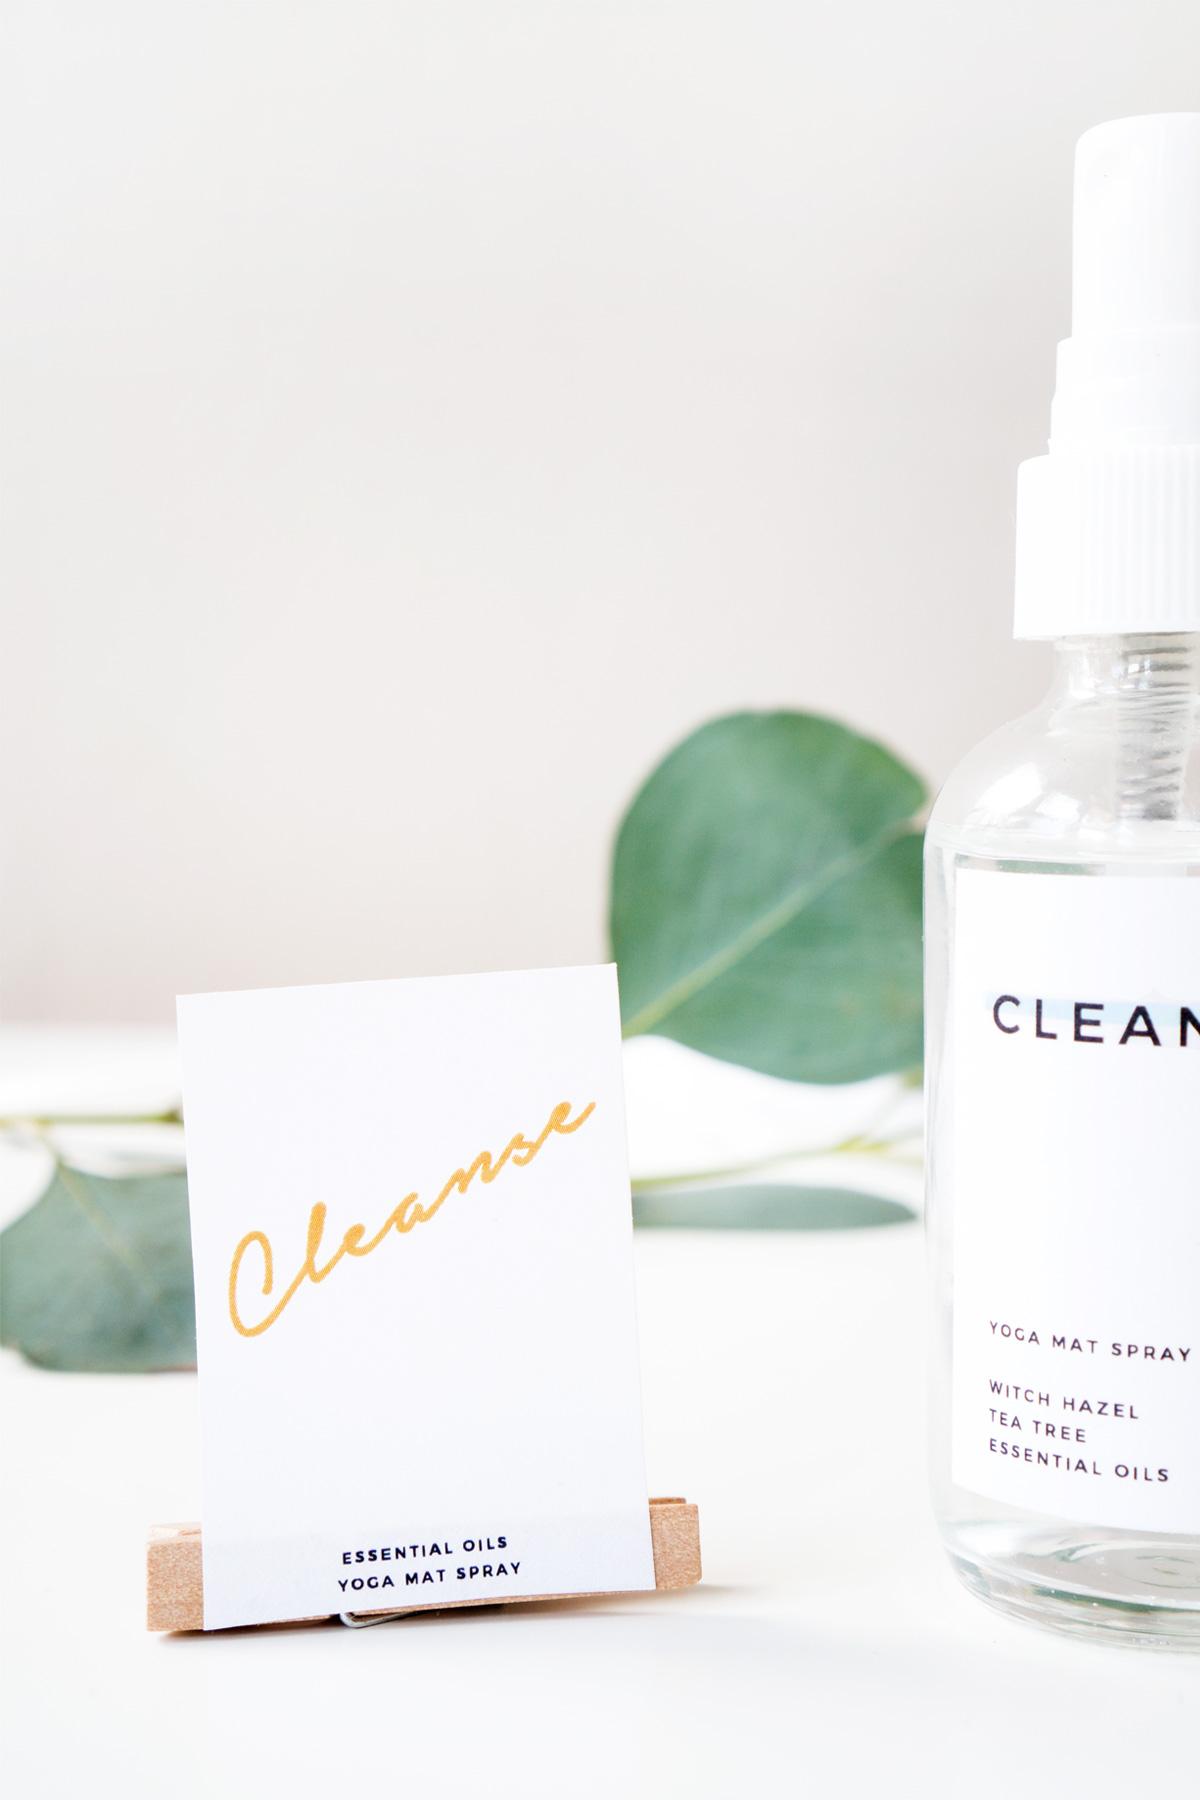 DIY Cleansing Yoga Mat Spray with Printable Labels | ctrl